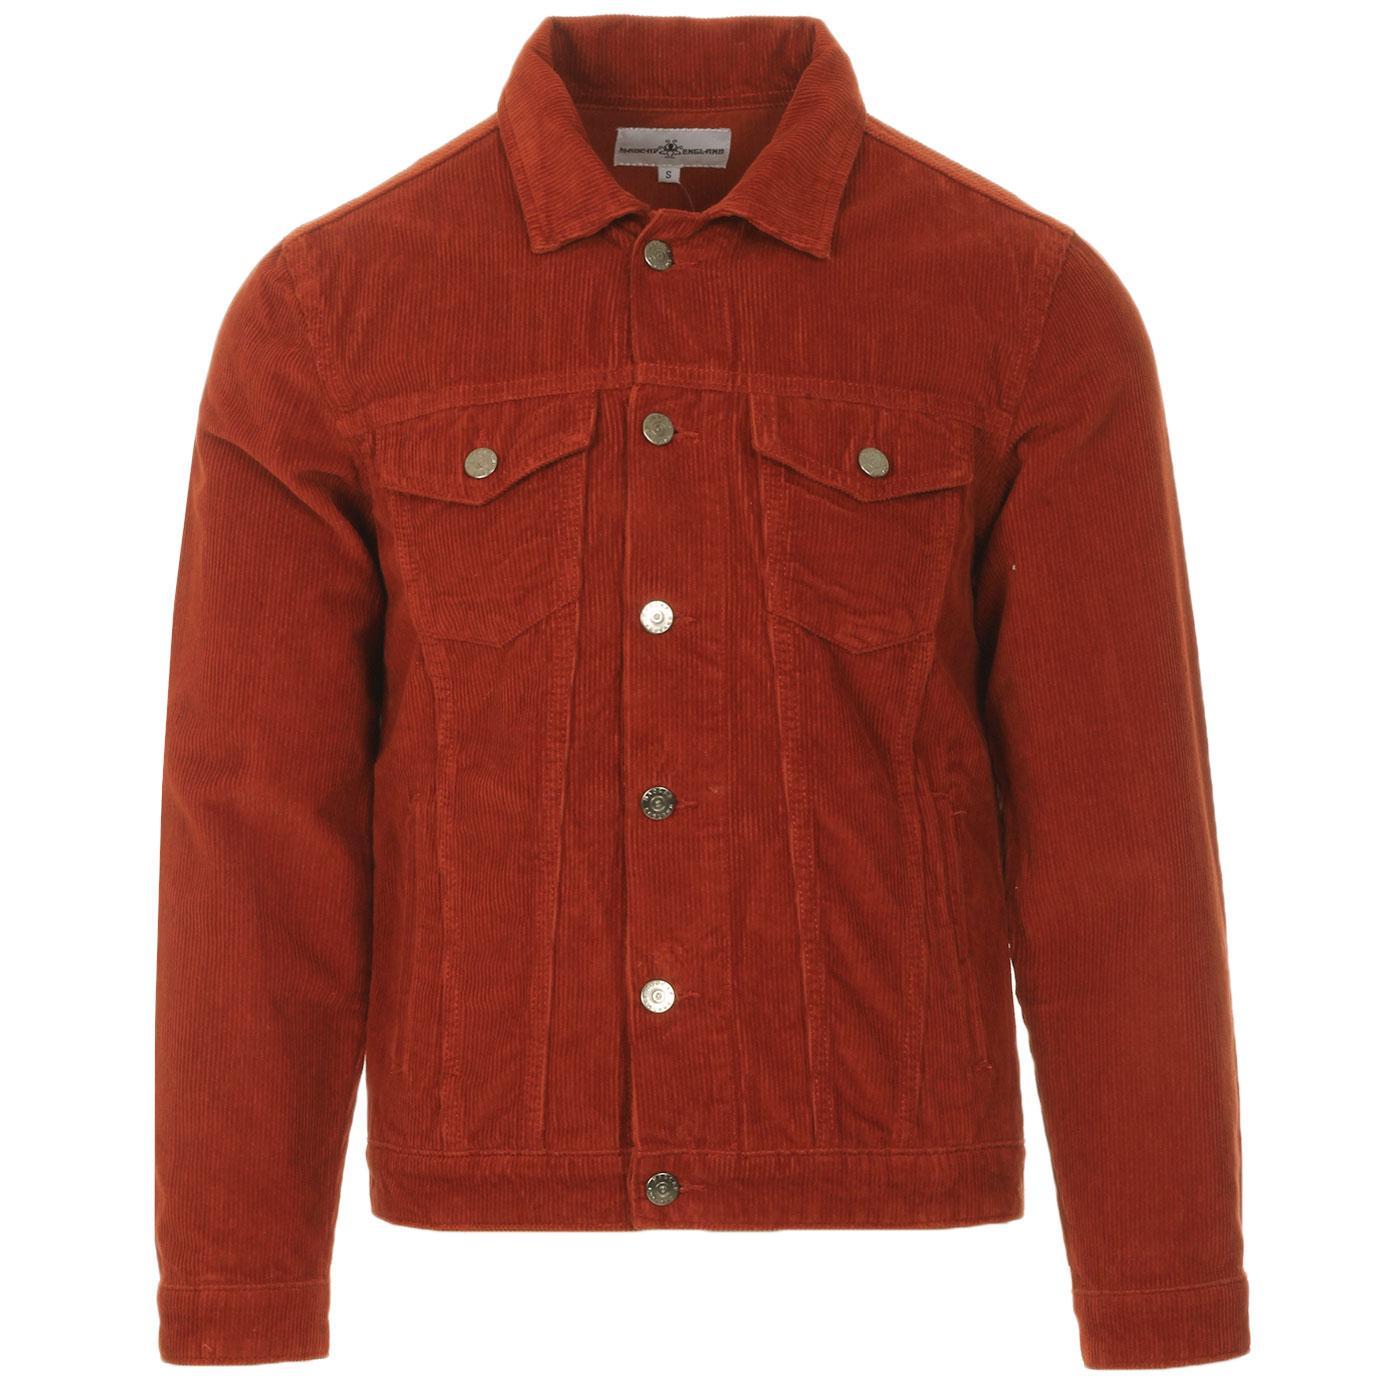 Woburn MADCAP ENGLAND Mod Cord Western Jacket (R)